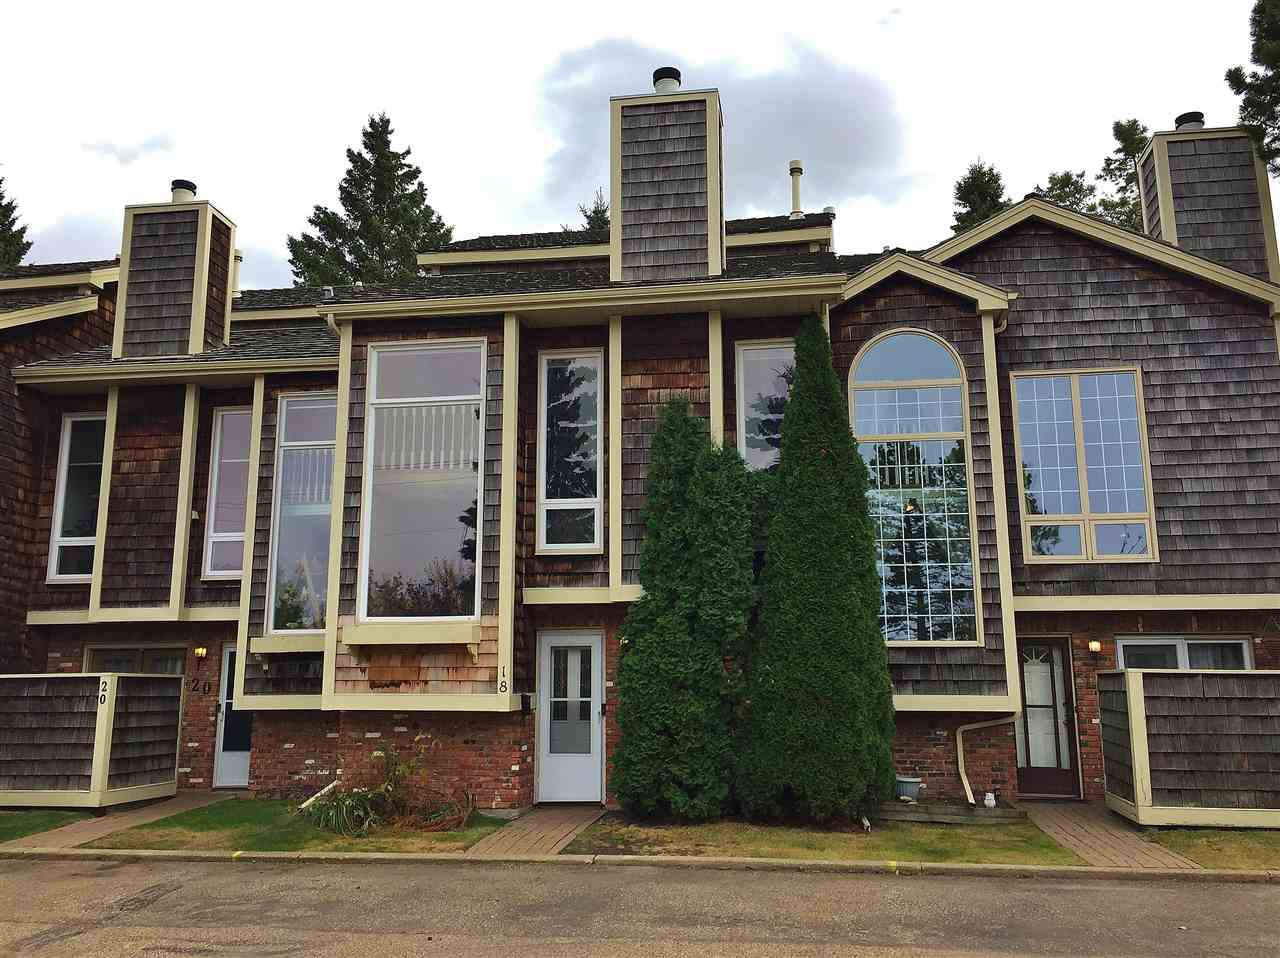 Main Photo: 18 1440 SHERWOOD Drive: Sherwood Park Townhouse for sale : MLS®# E4218324